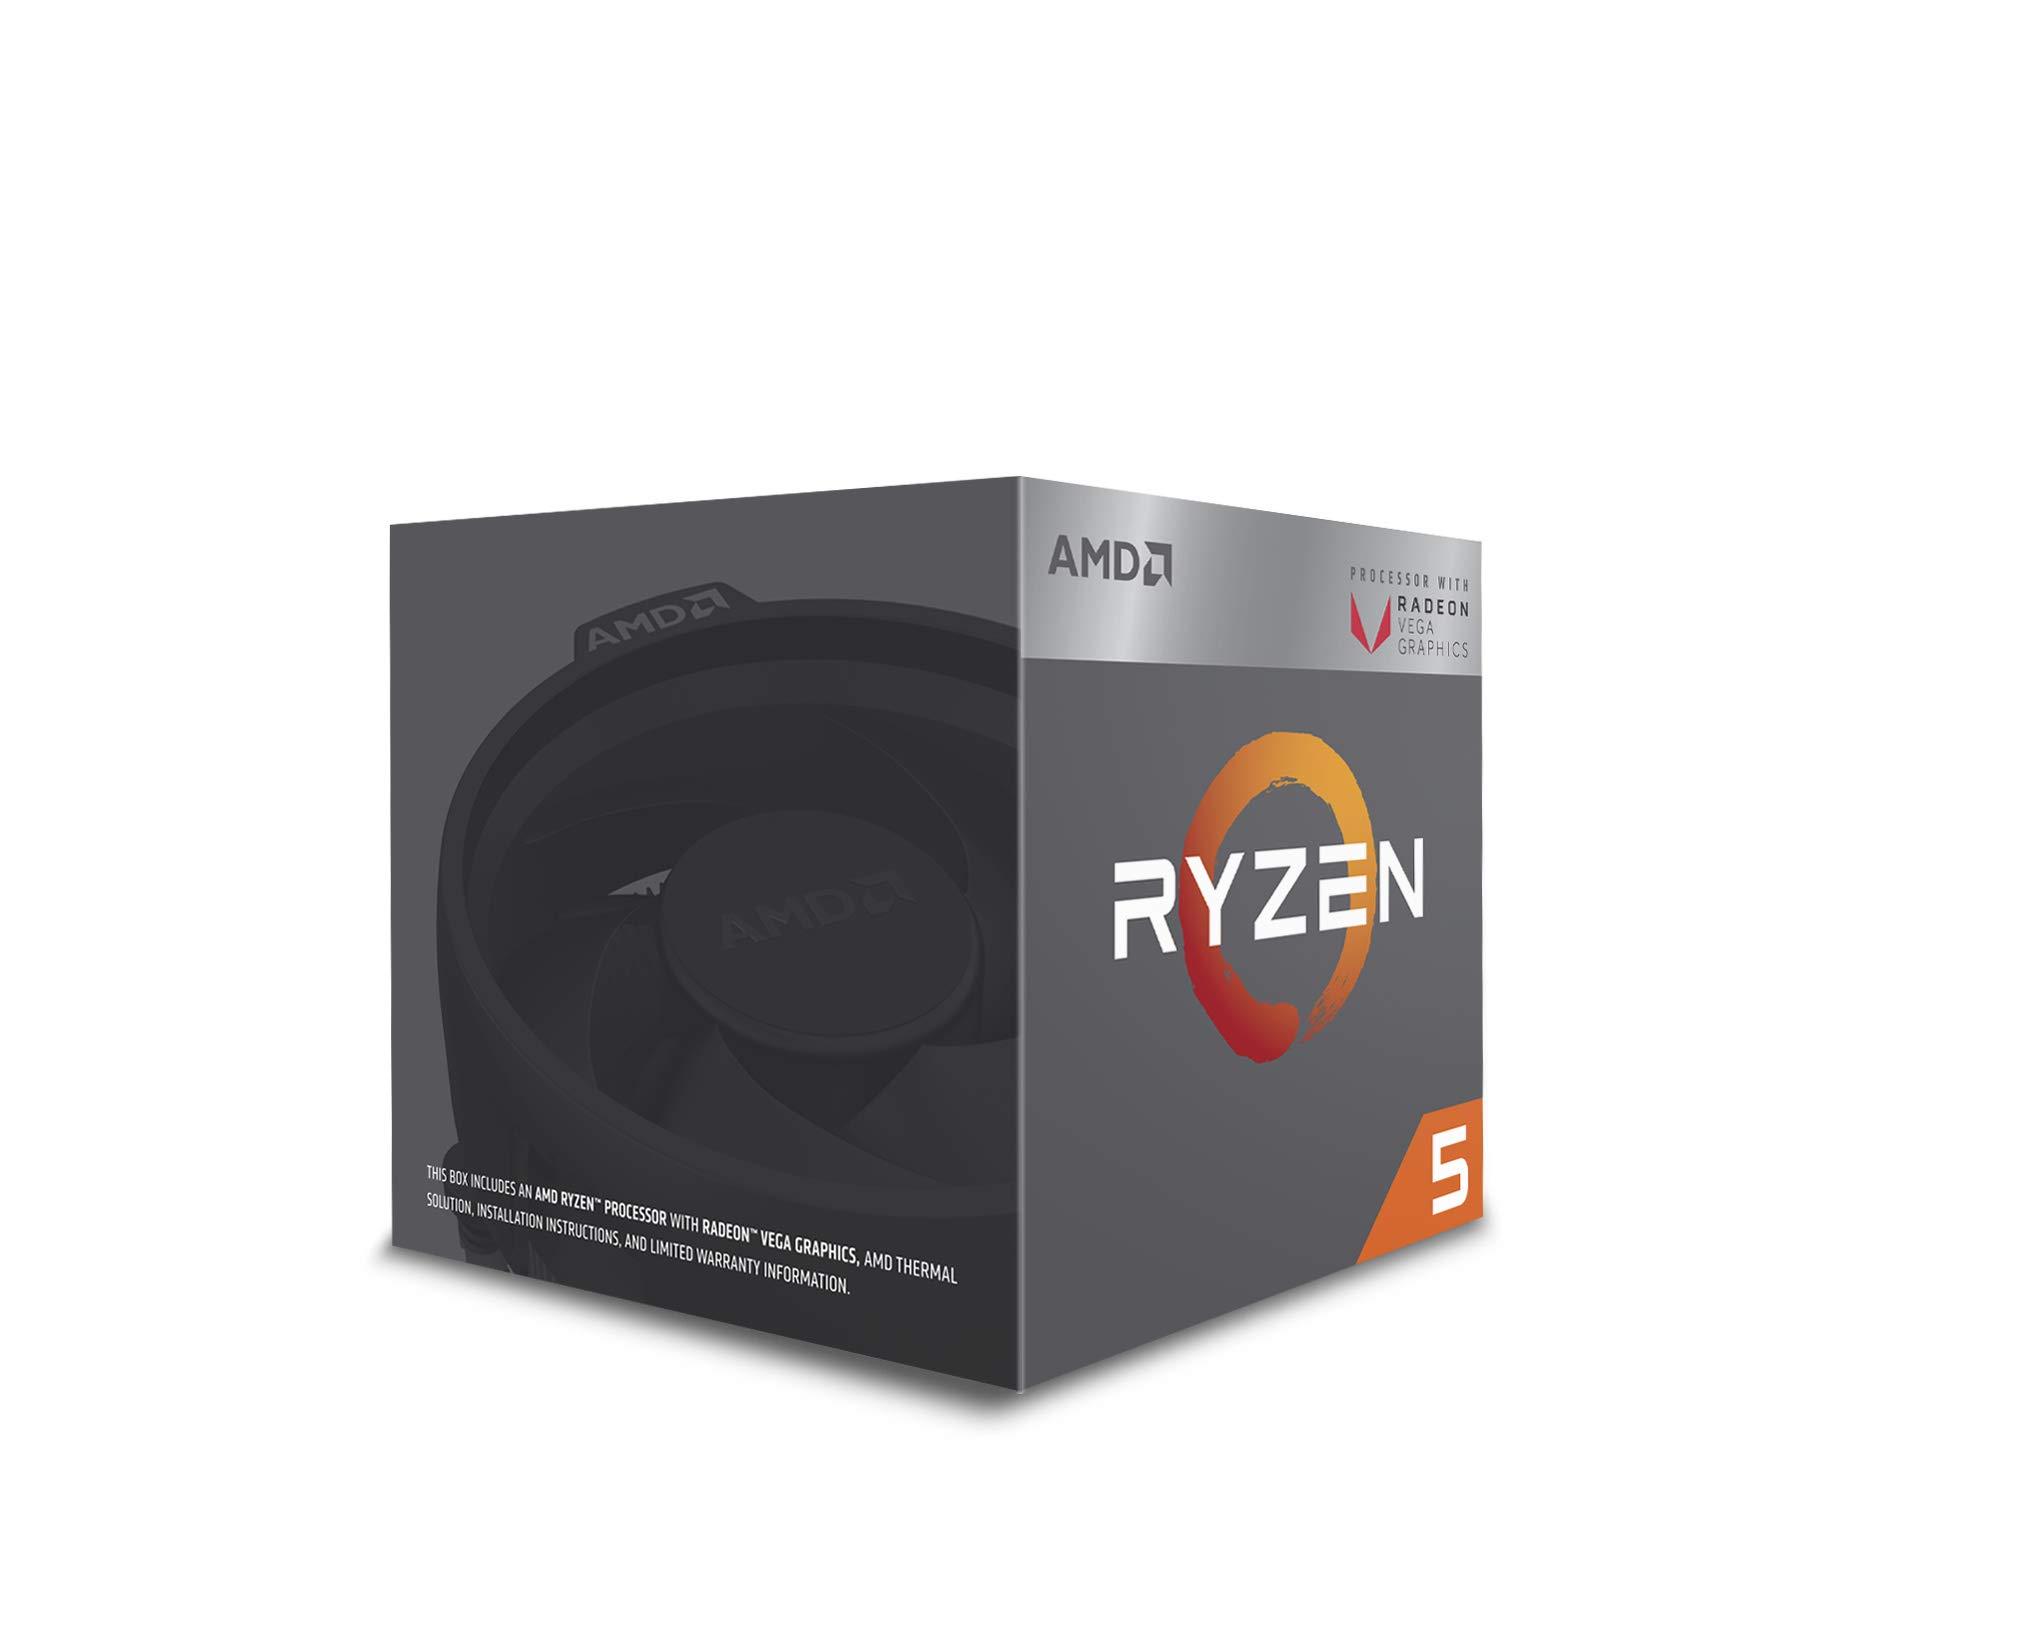 AMD Ryzen 5 2400G con Radeon RX Vega 11 Graphics - YD2400C5F